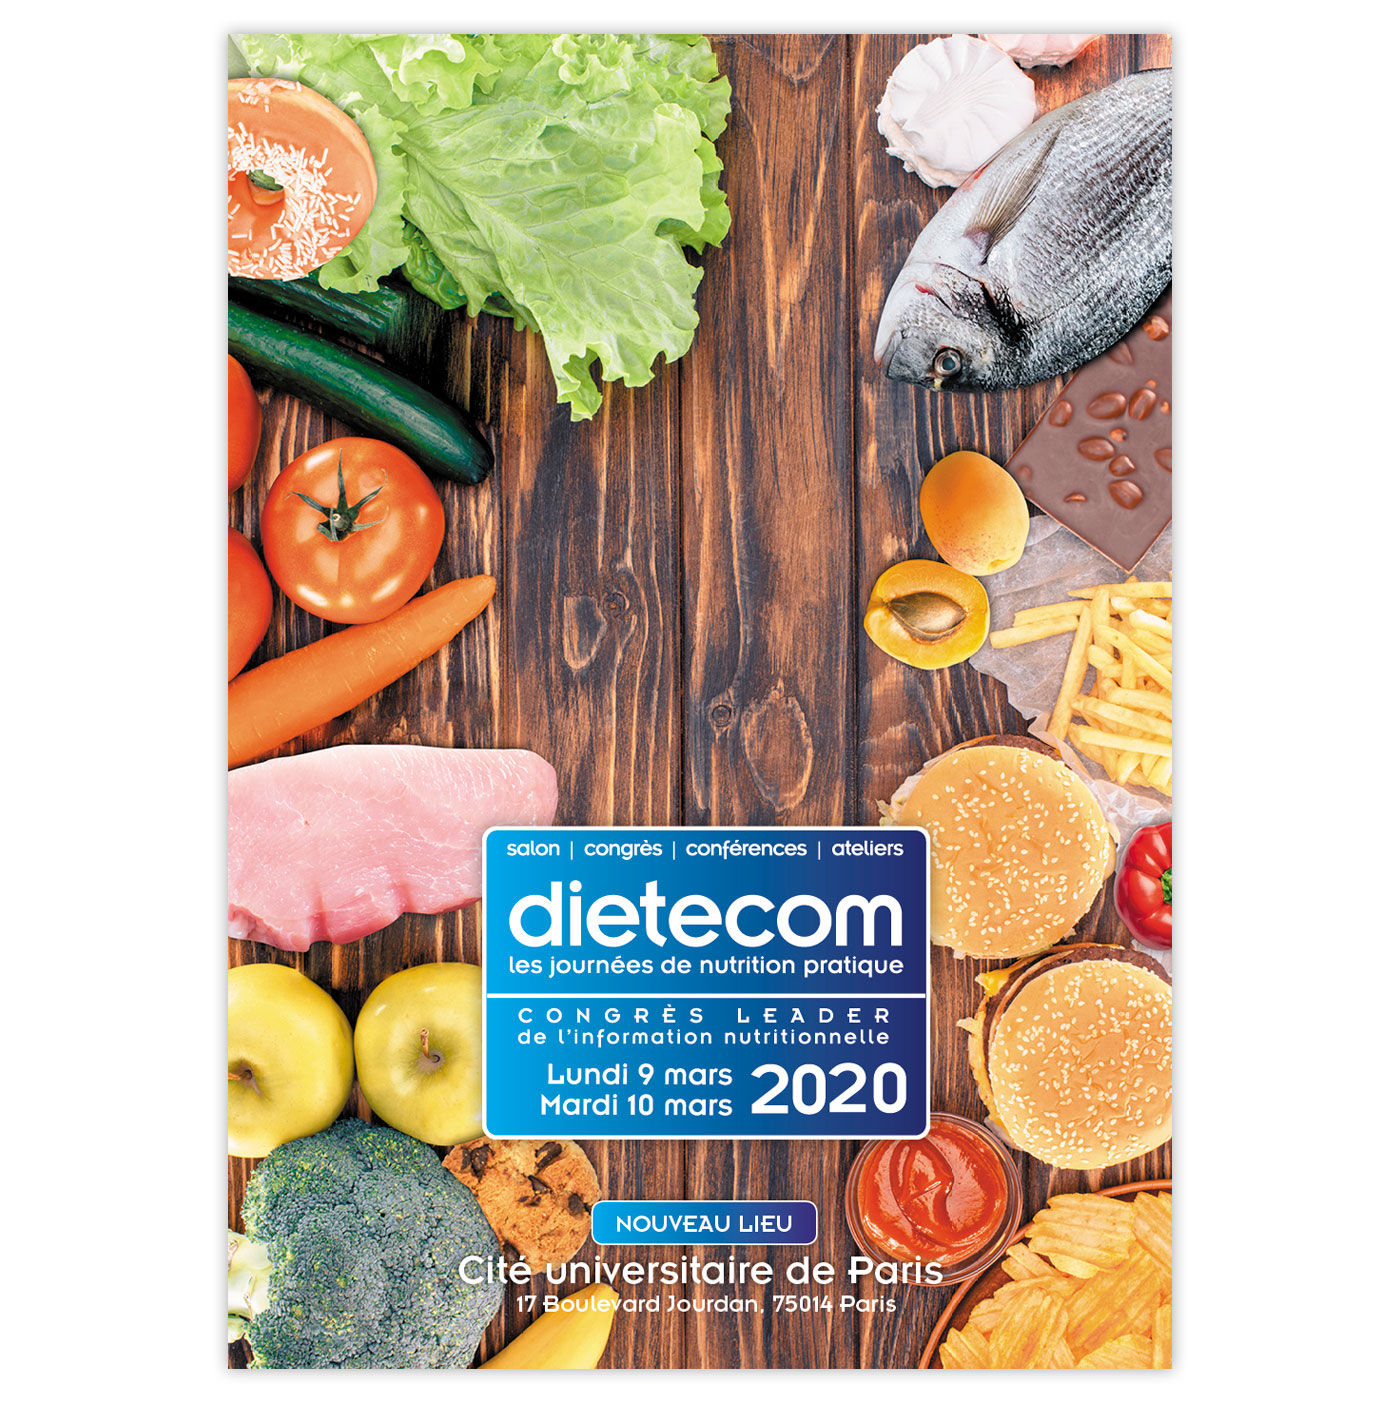 Couv-Dietecom-2020-Def